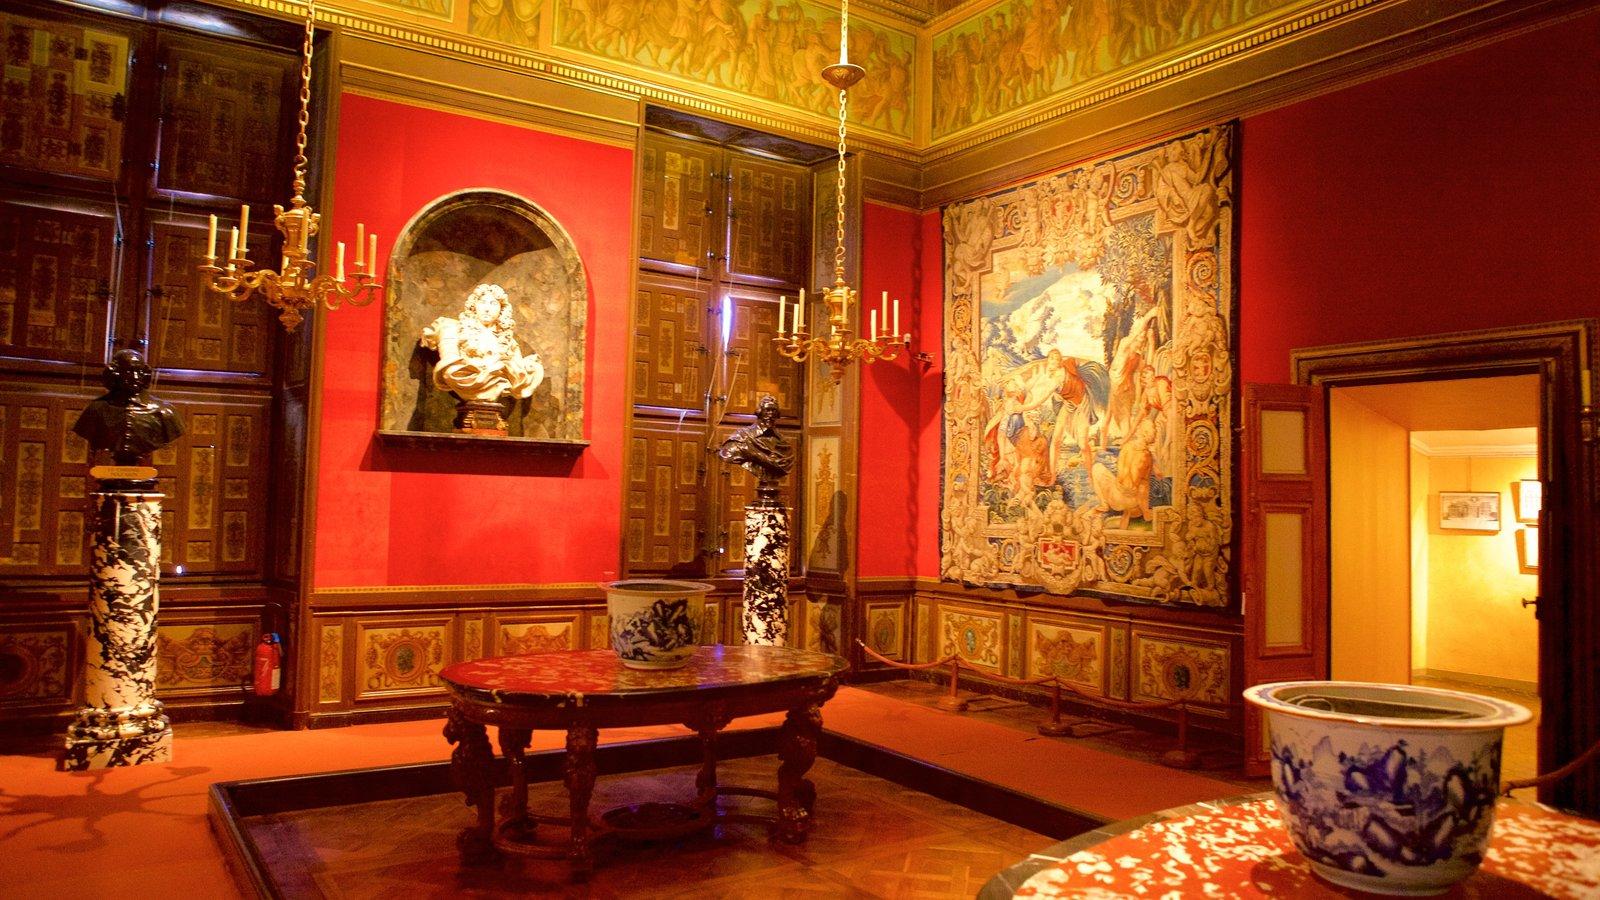 Melun mostrando vistas internas, elementos de patrimônio e arte